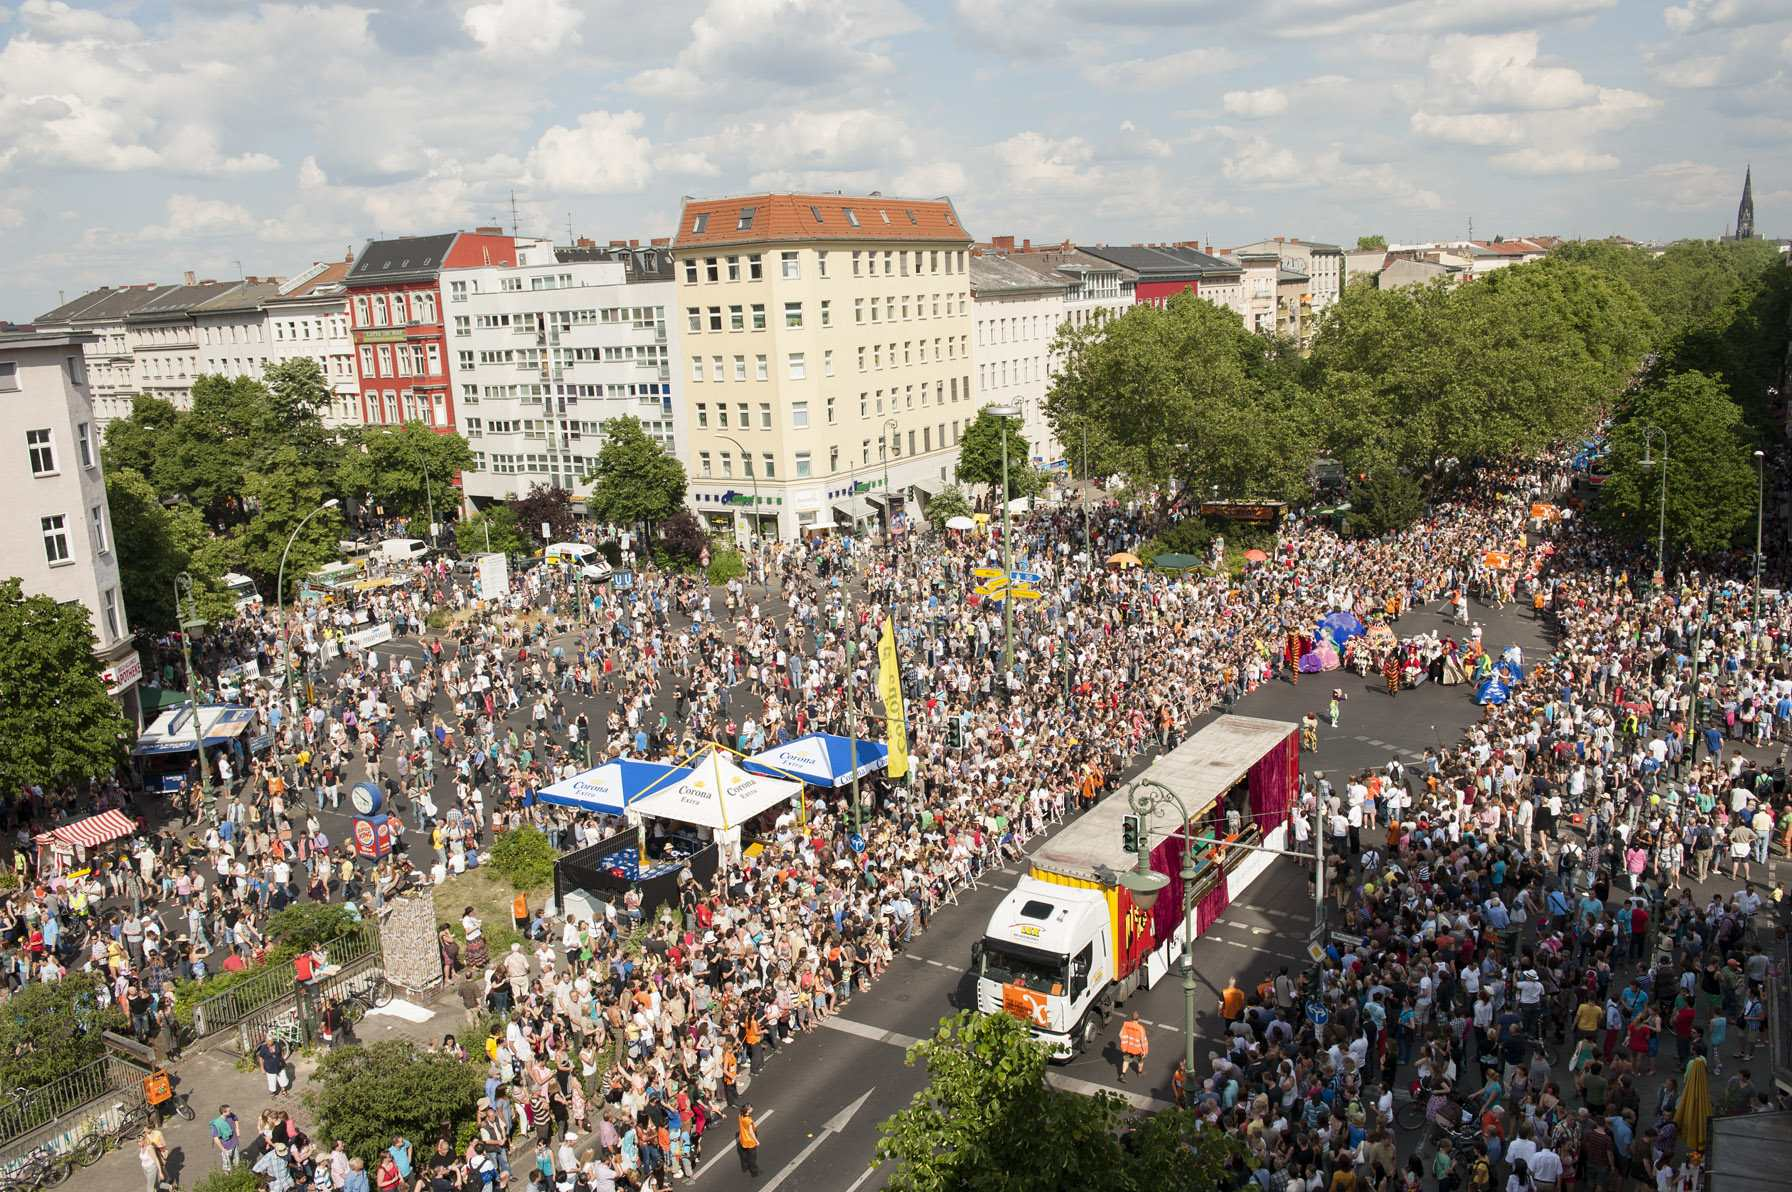 Carnaval des cultures Berlin